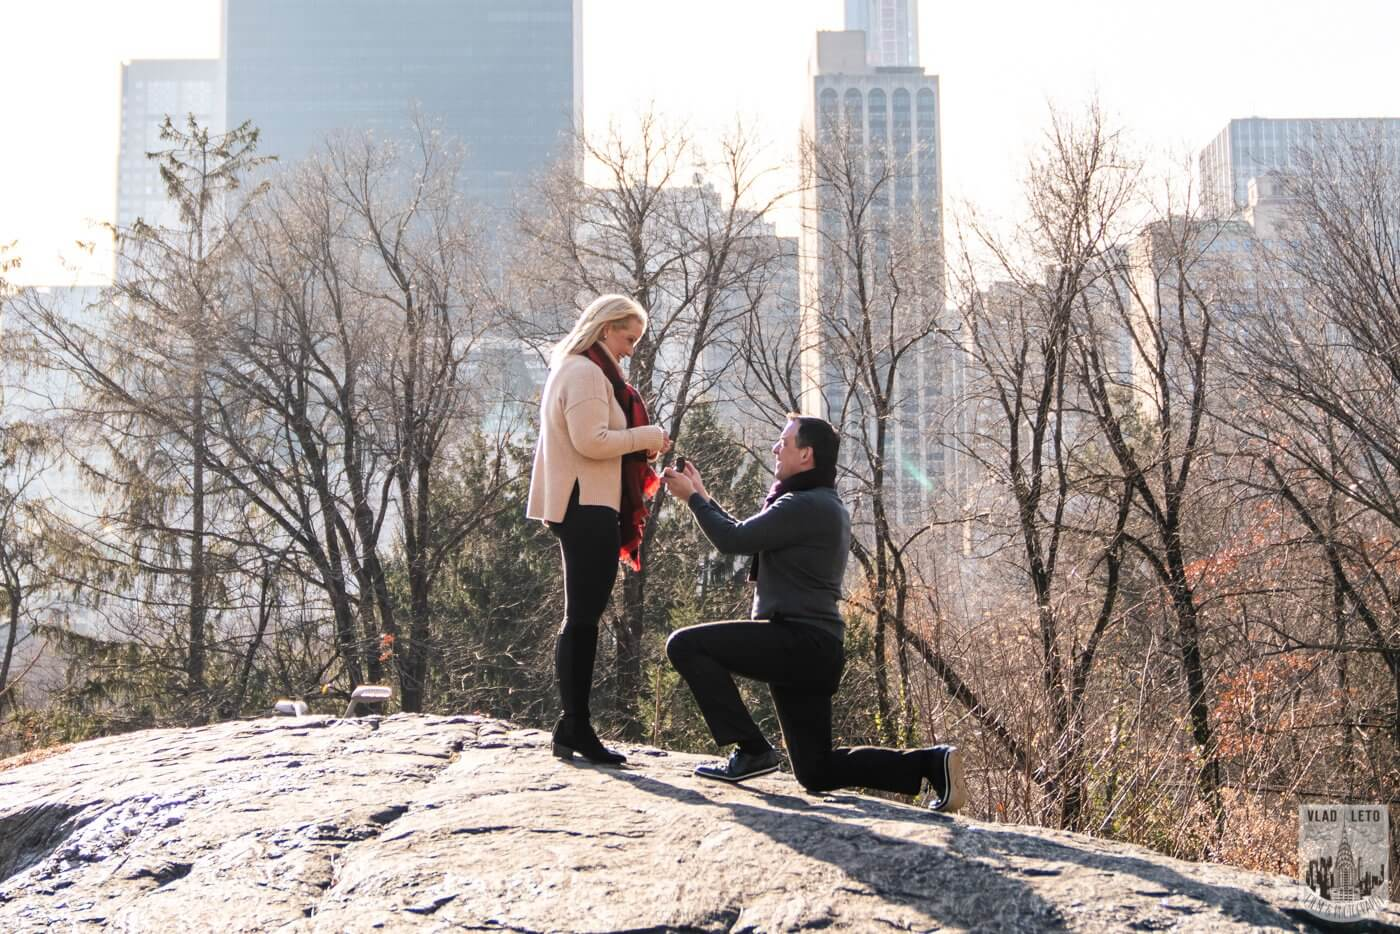 Photo 3 Central Park Wedding proposal | VladLeto